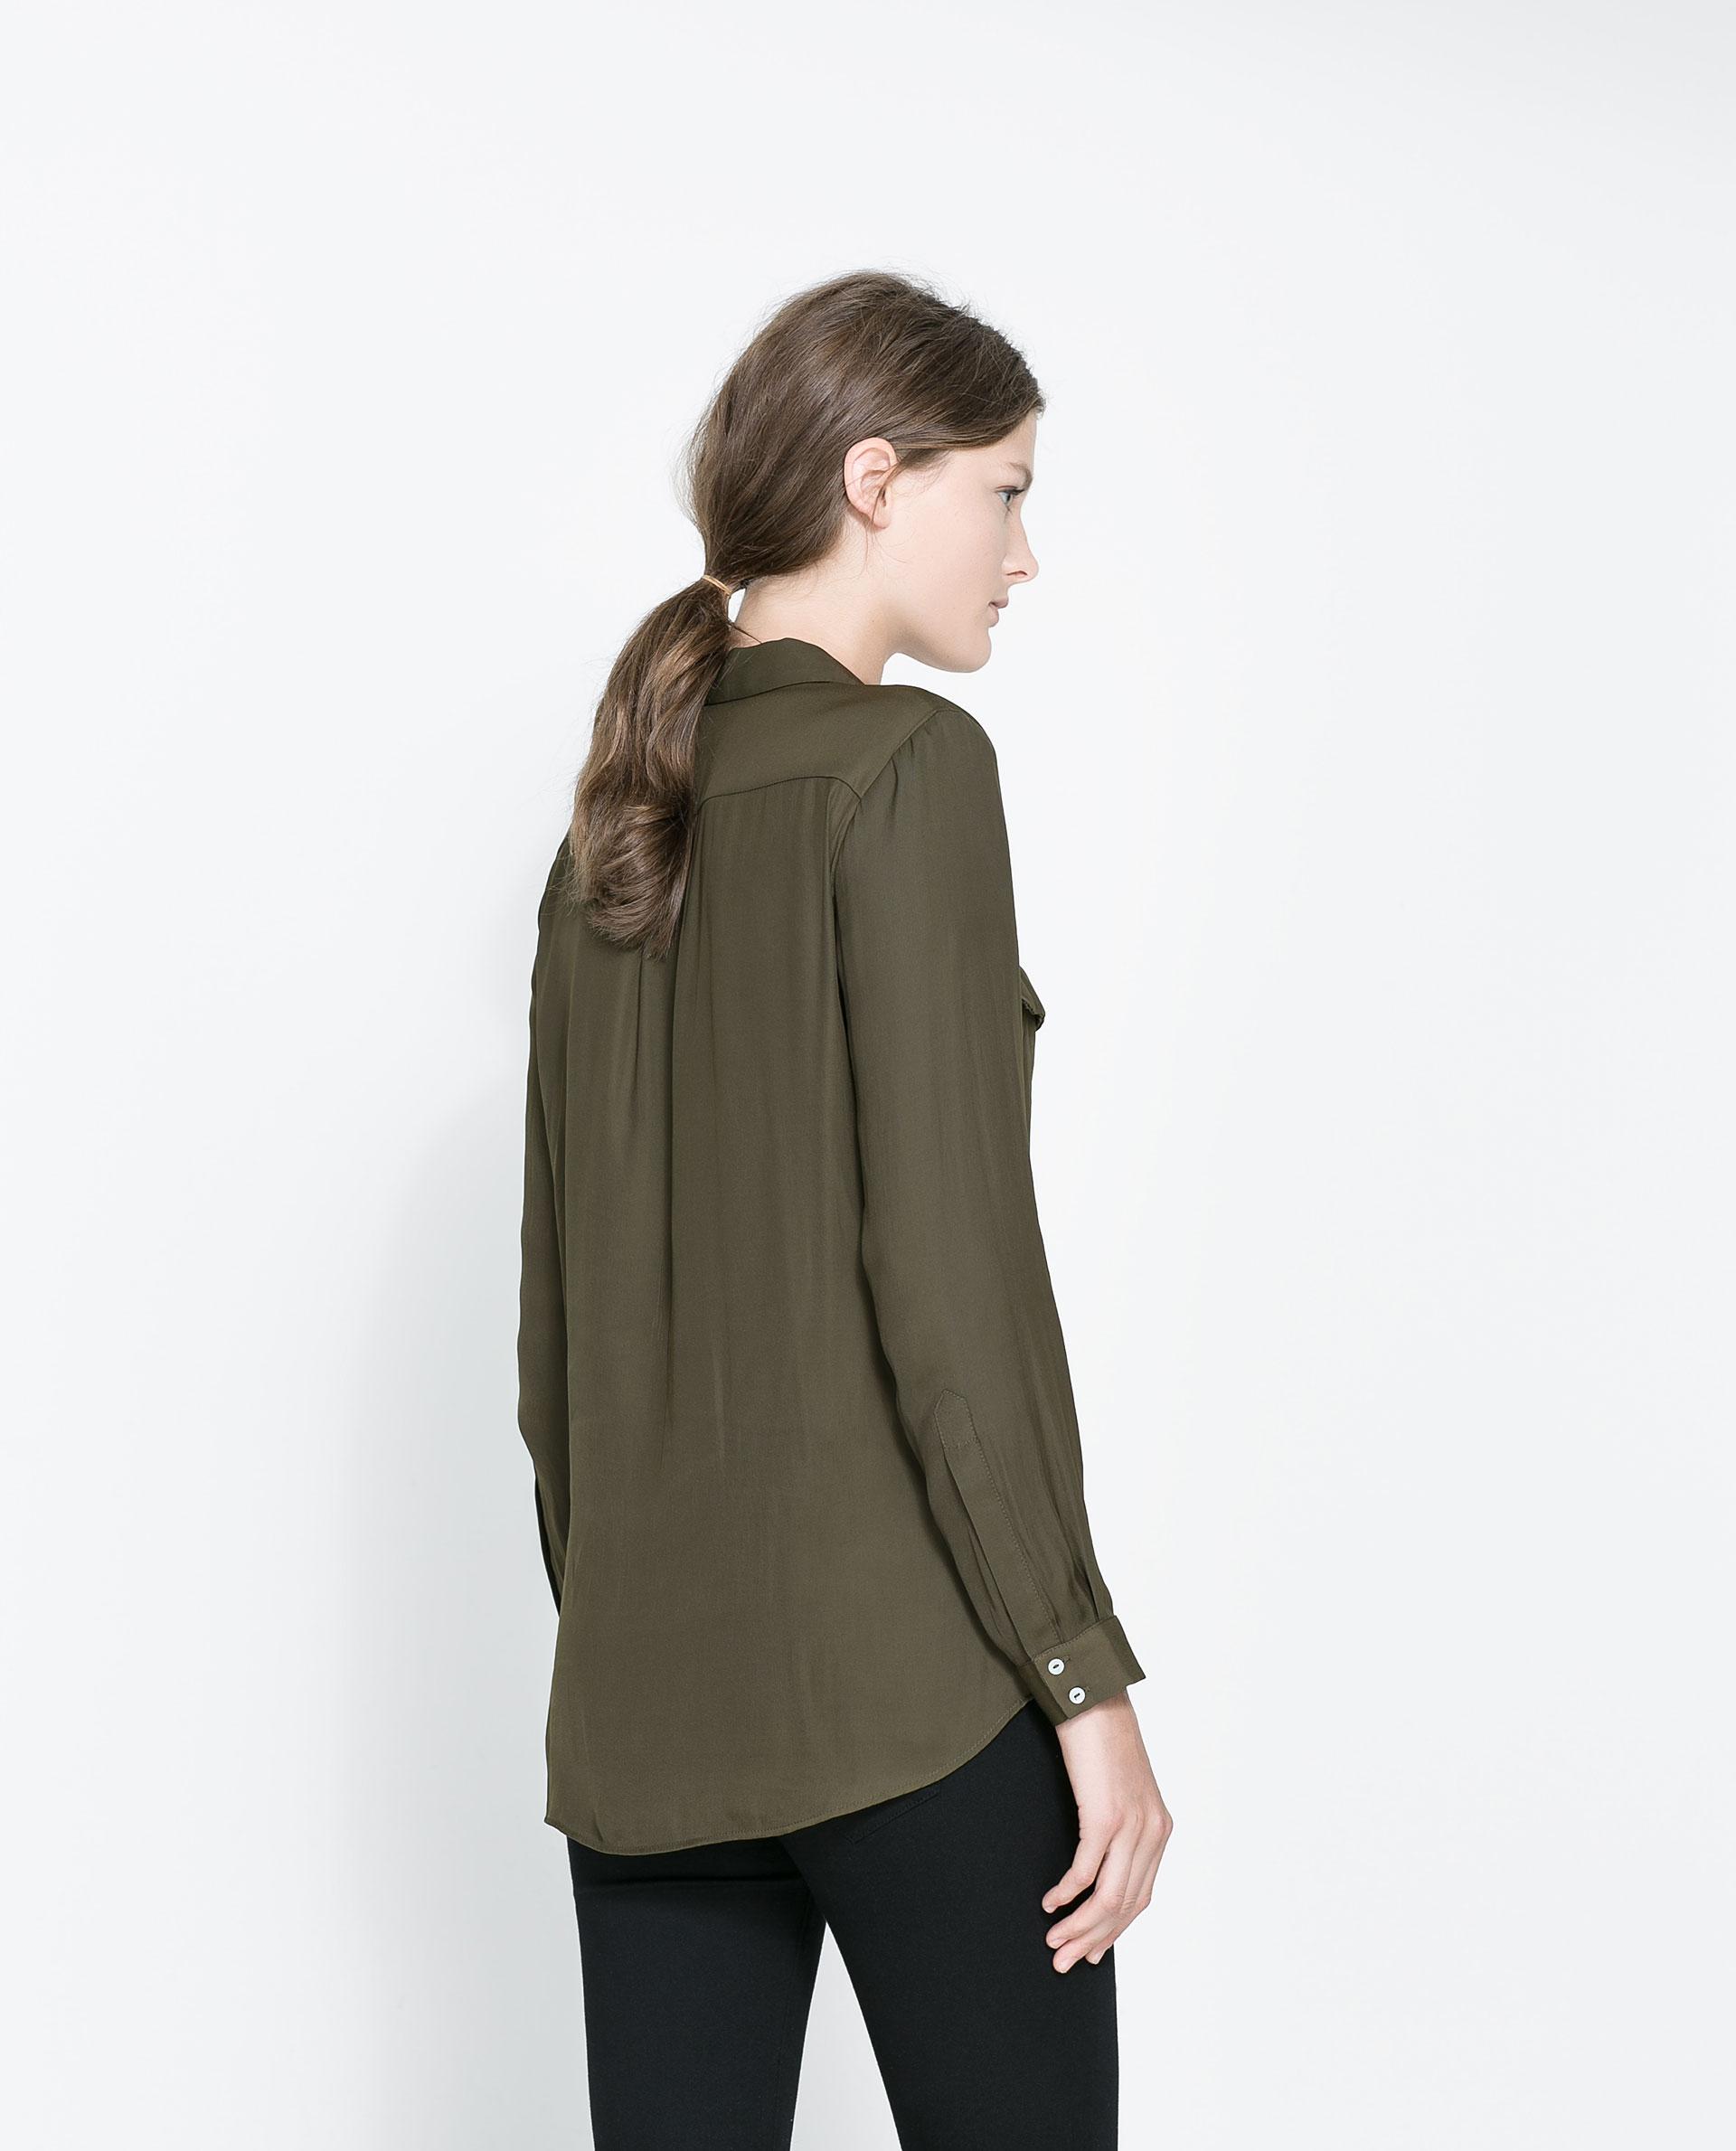 Zara Shirt Style Blouse 7